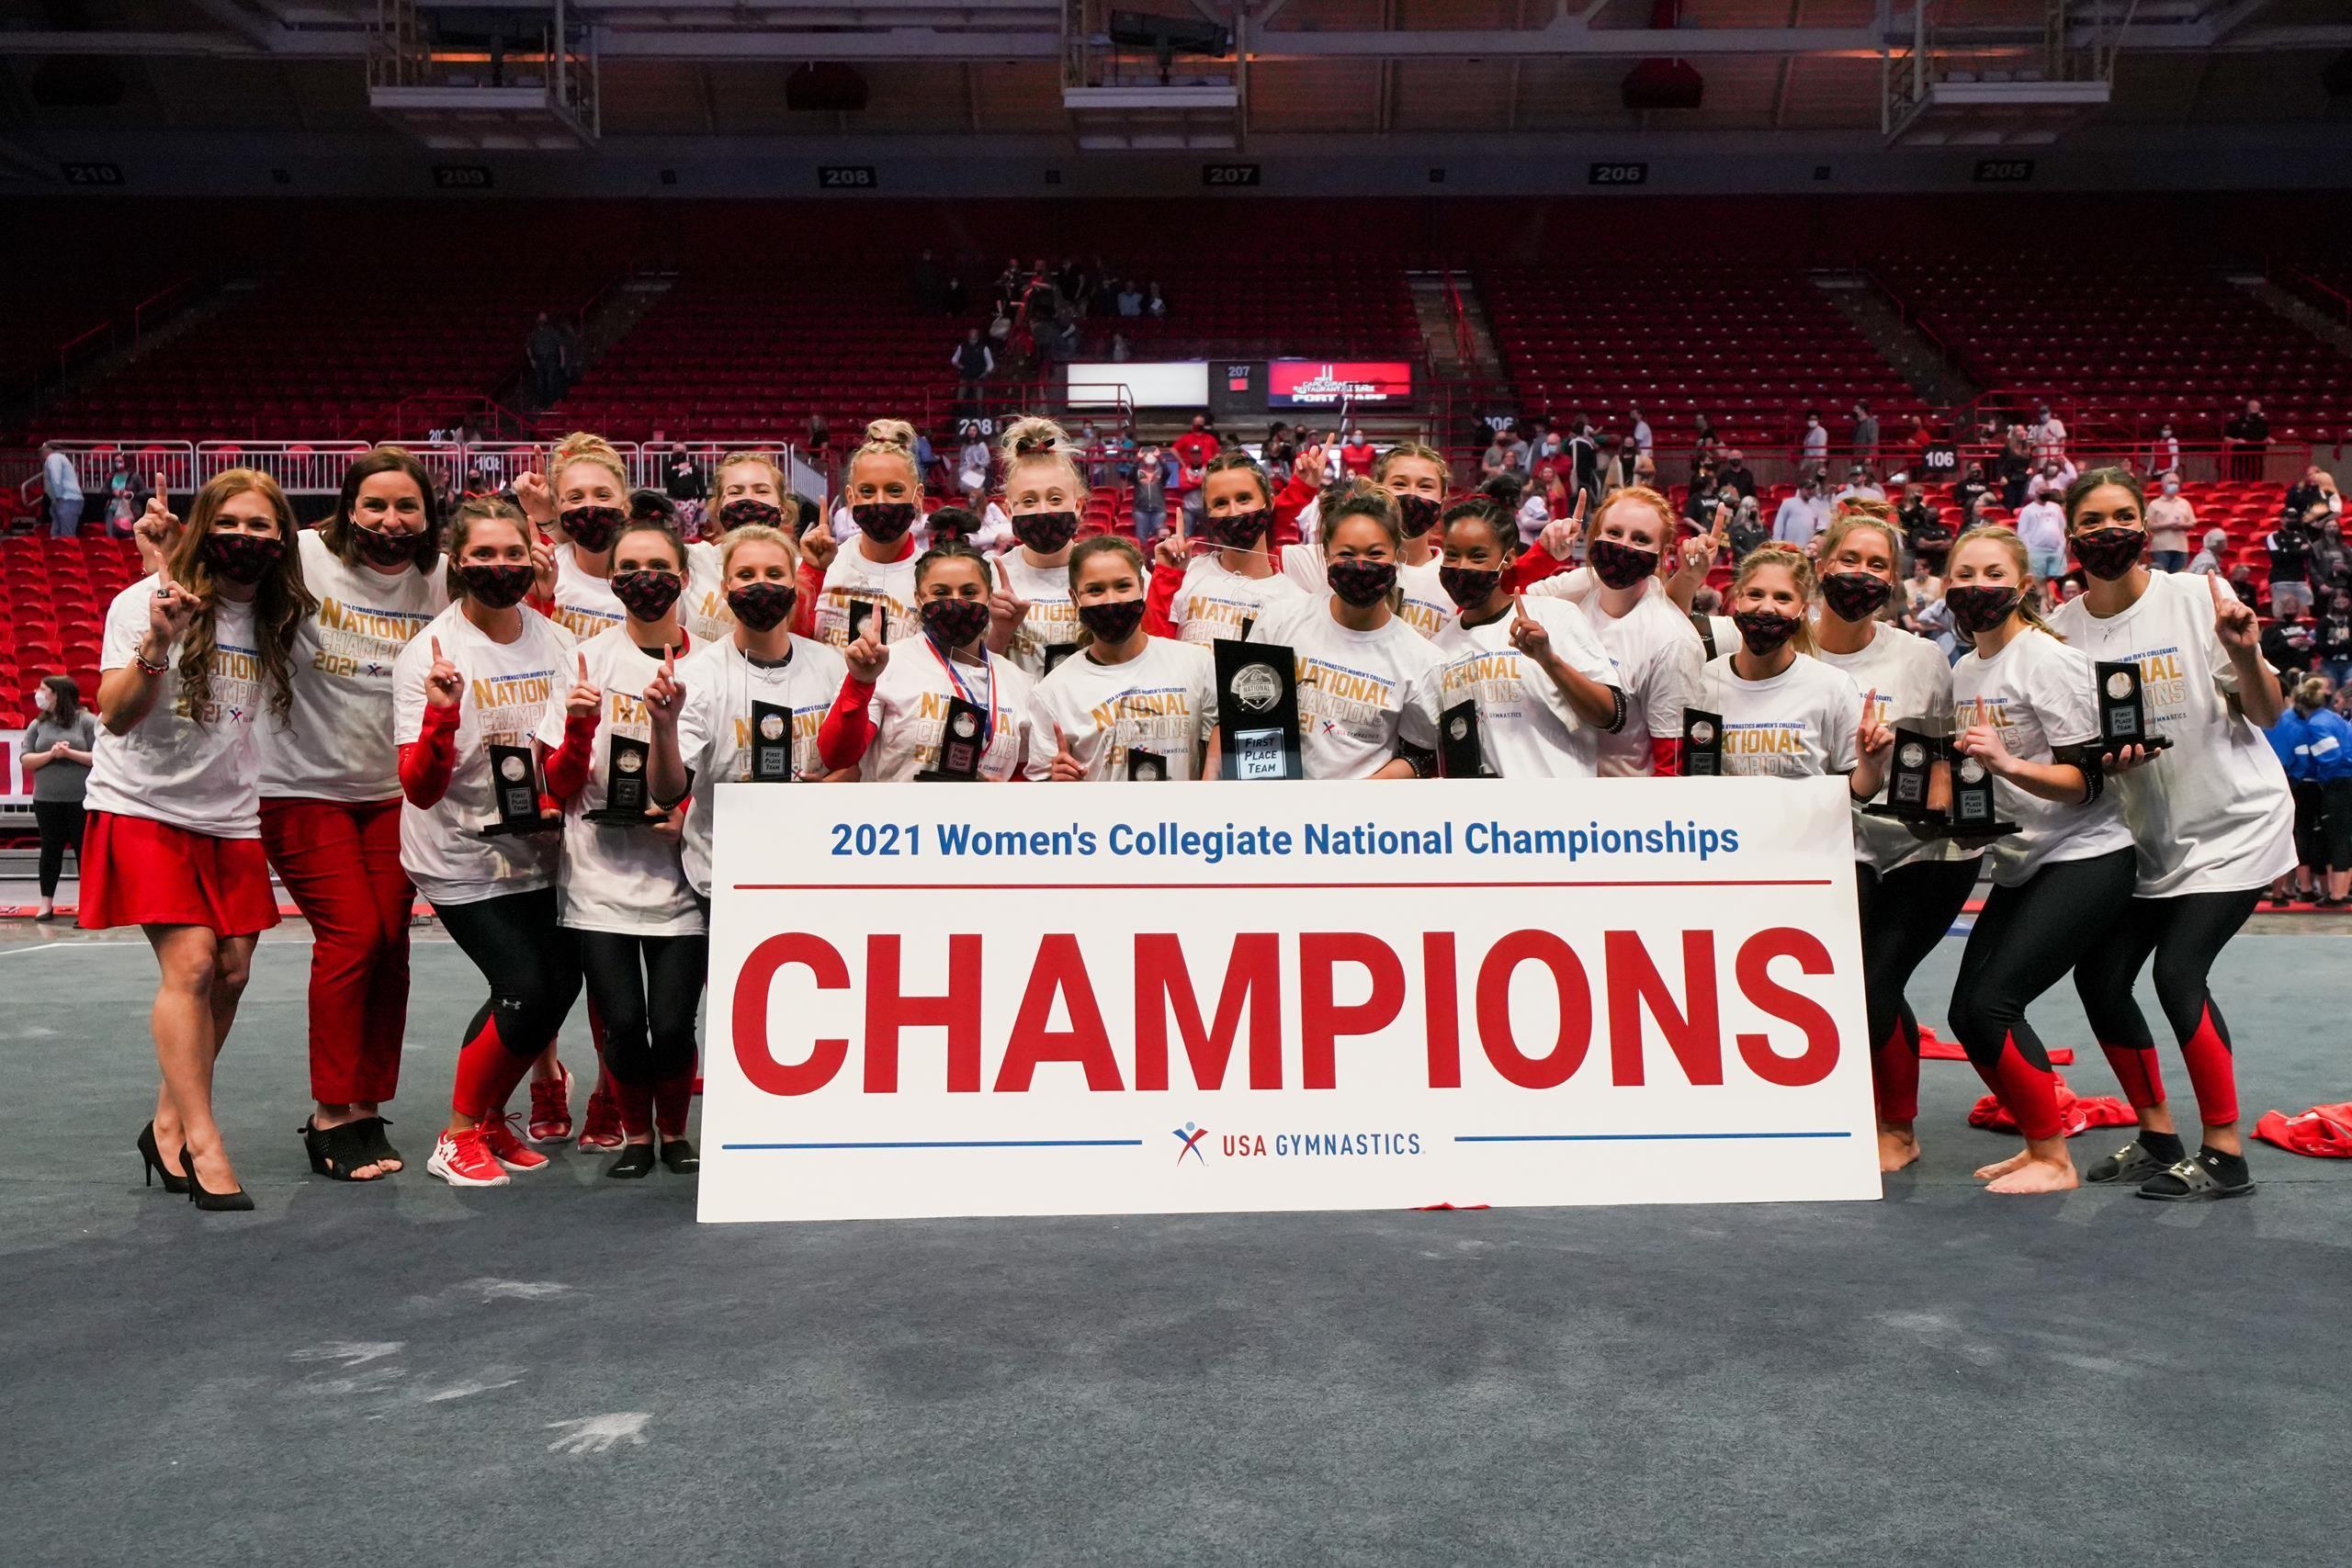 Two-Minute Drill: Redhawks Capture 2021 USA Gymnastics Women's Collegiate National Championship